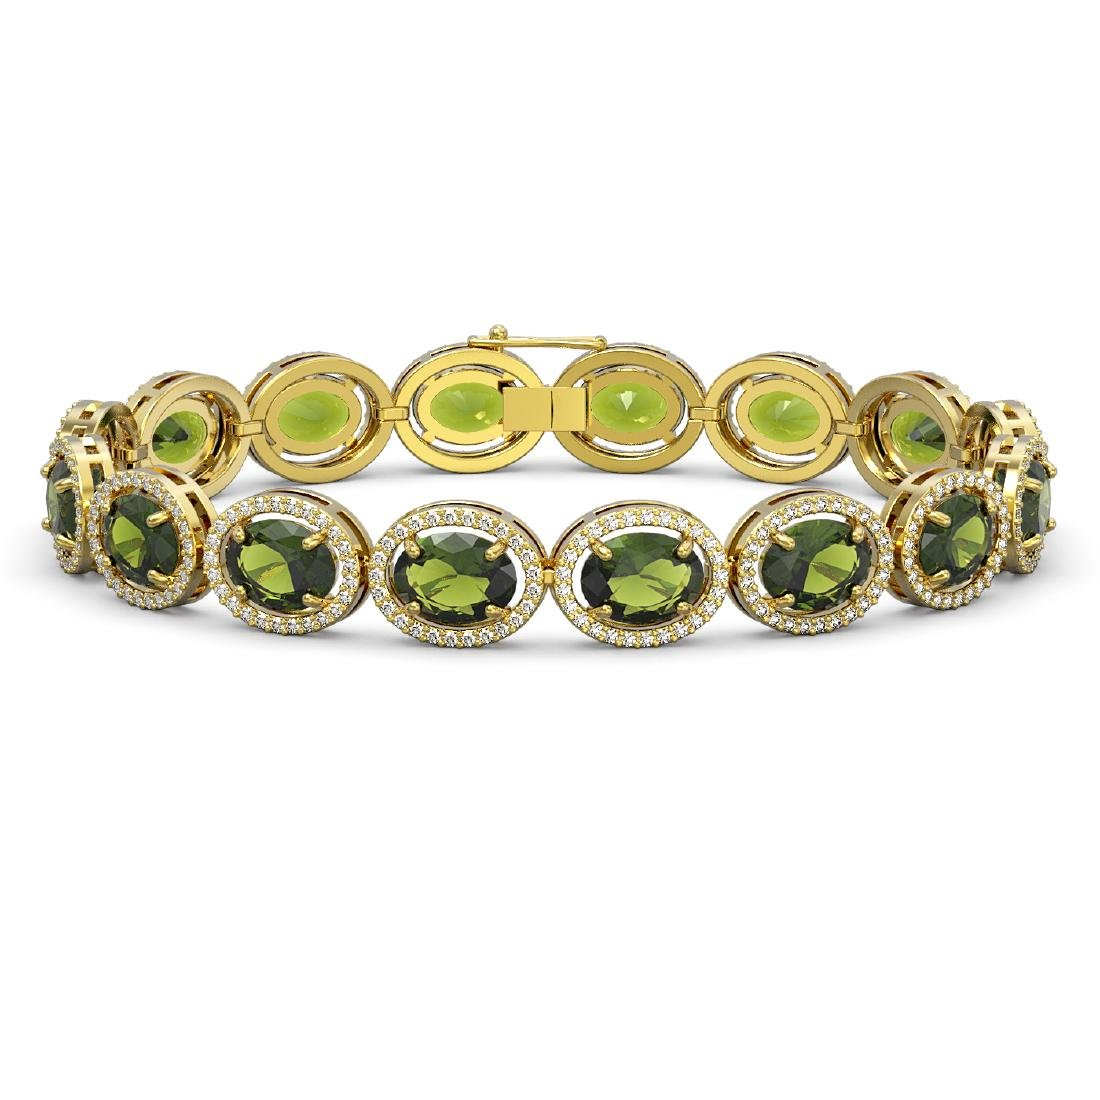 23.6 CTW Tourmaline & Diamond Halo Bracelet 10K Yellow